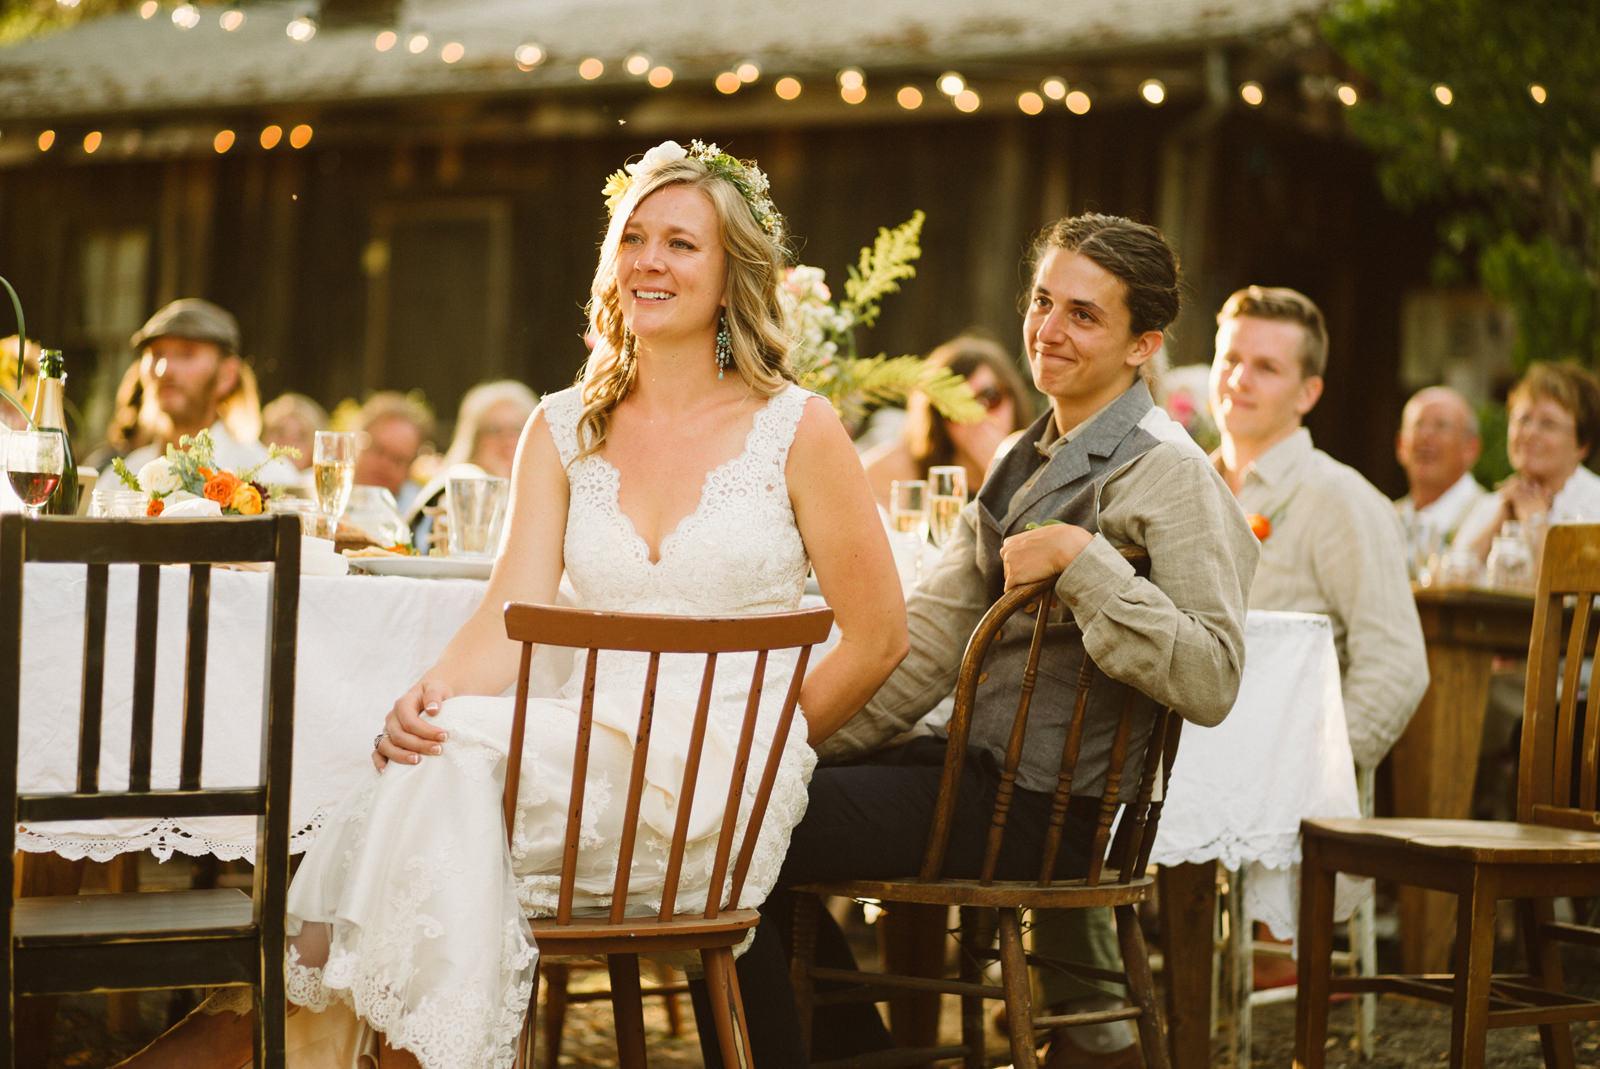 rivers-bend-retreat-wedding-086 RIVER'S BEND RETREAT WEDDING